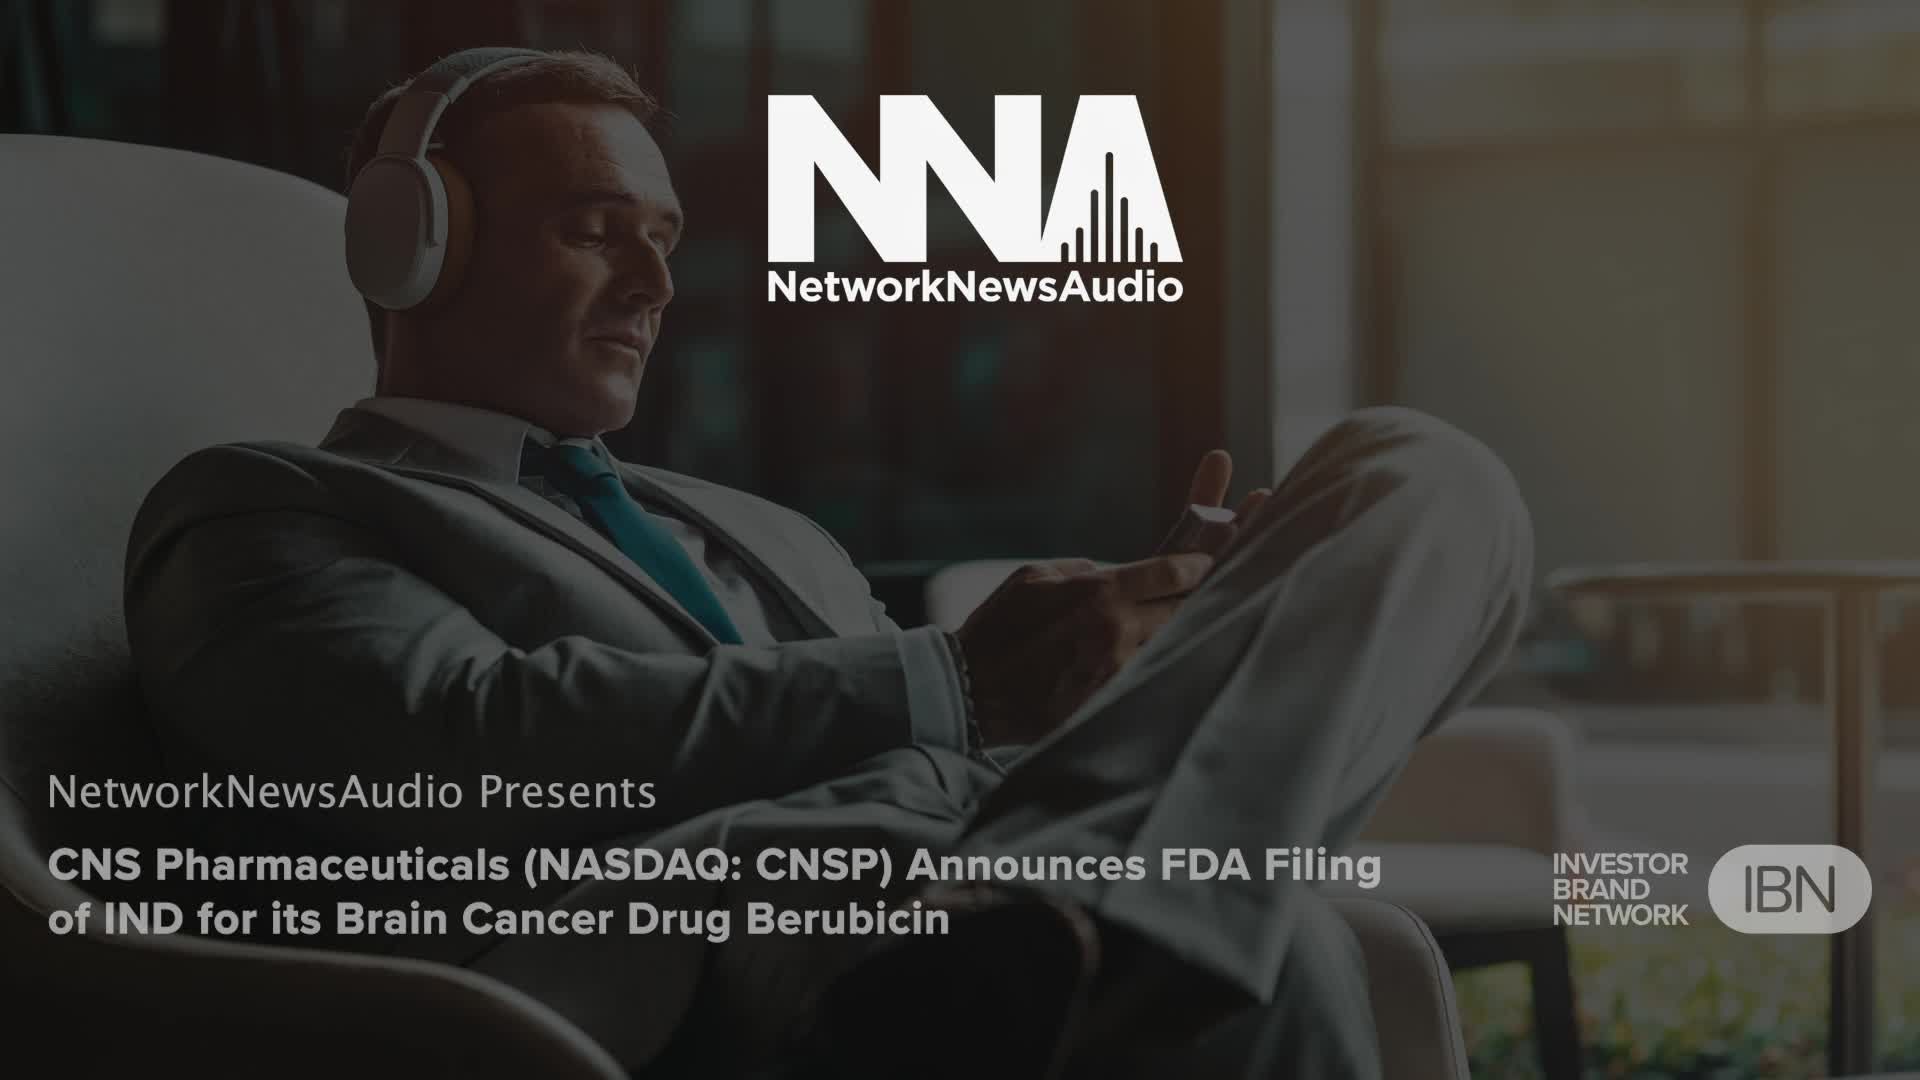 InvestorBrandNetwork-NetworkNewsAudio News-CNS Pharmaceuticals Inc. (NASDAQ: CNSP) Announces FDA Filing of IND for its Brain Cancer Drug Berubicin